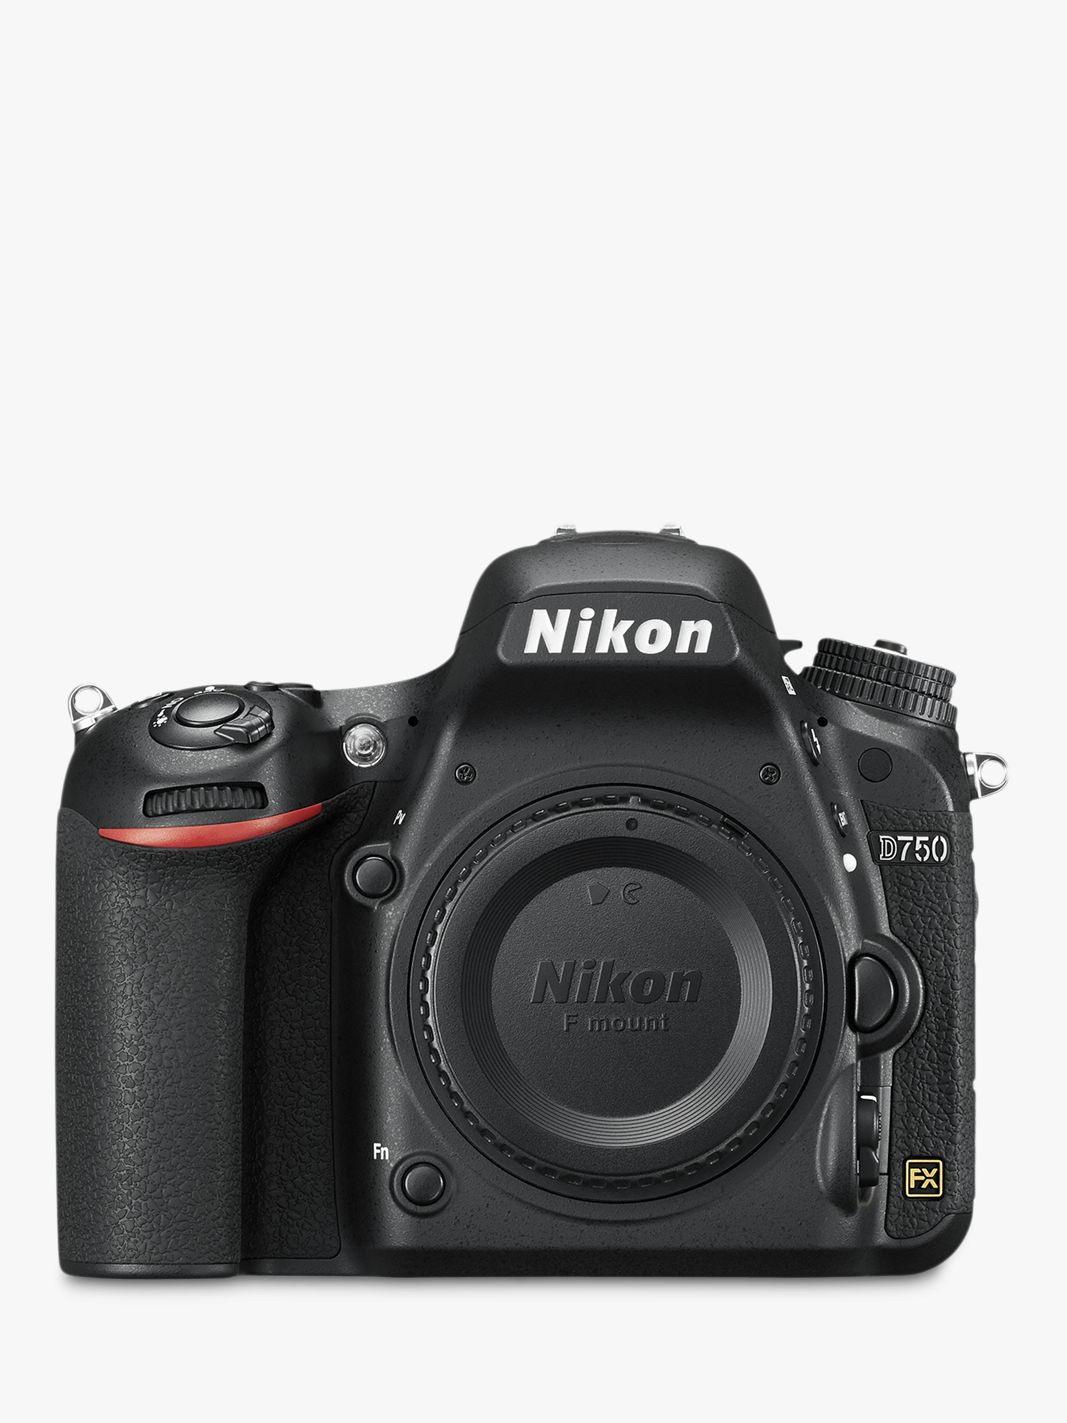 Nikon Nikon D750 Digital SLR Camera, HD 1080p, 24.3MP, Wi-Fi, 3.2 Tilting LCD Screen, Black, Body Only